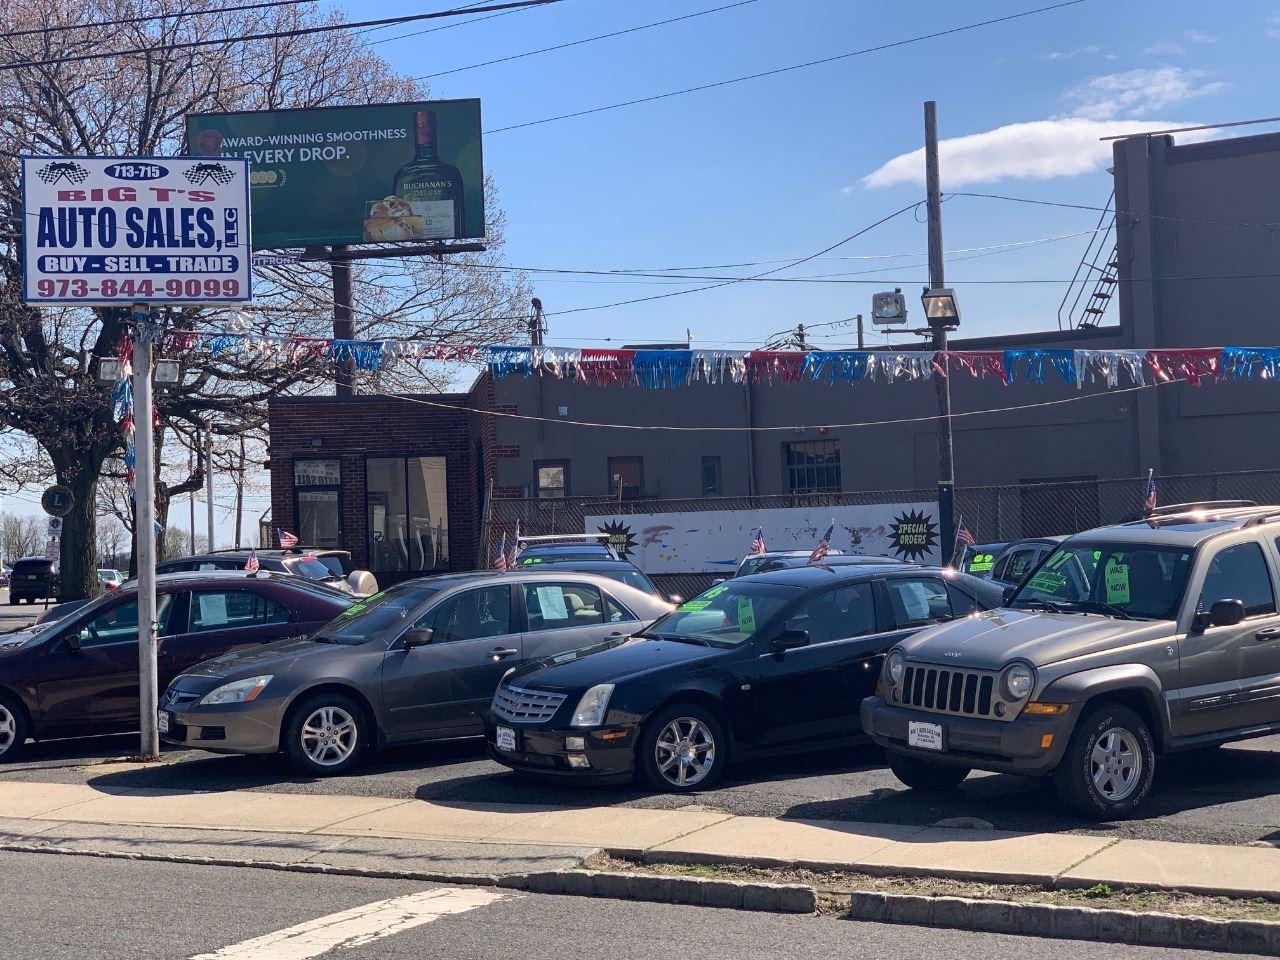 Big T's Auto Sales